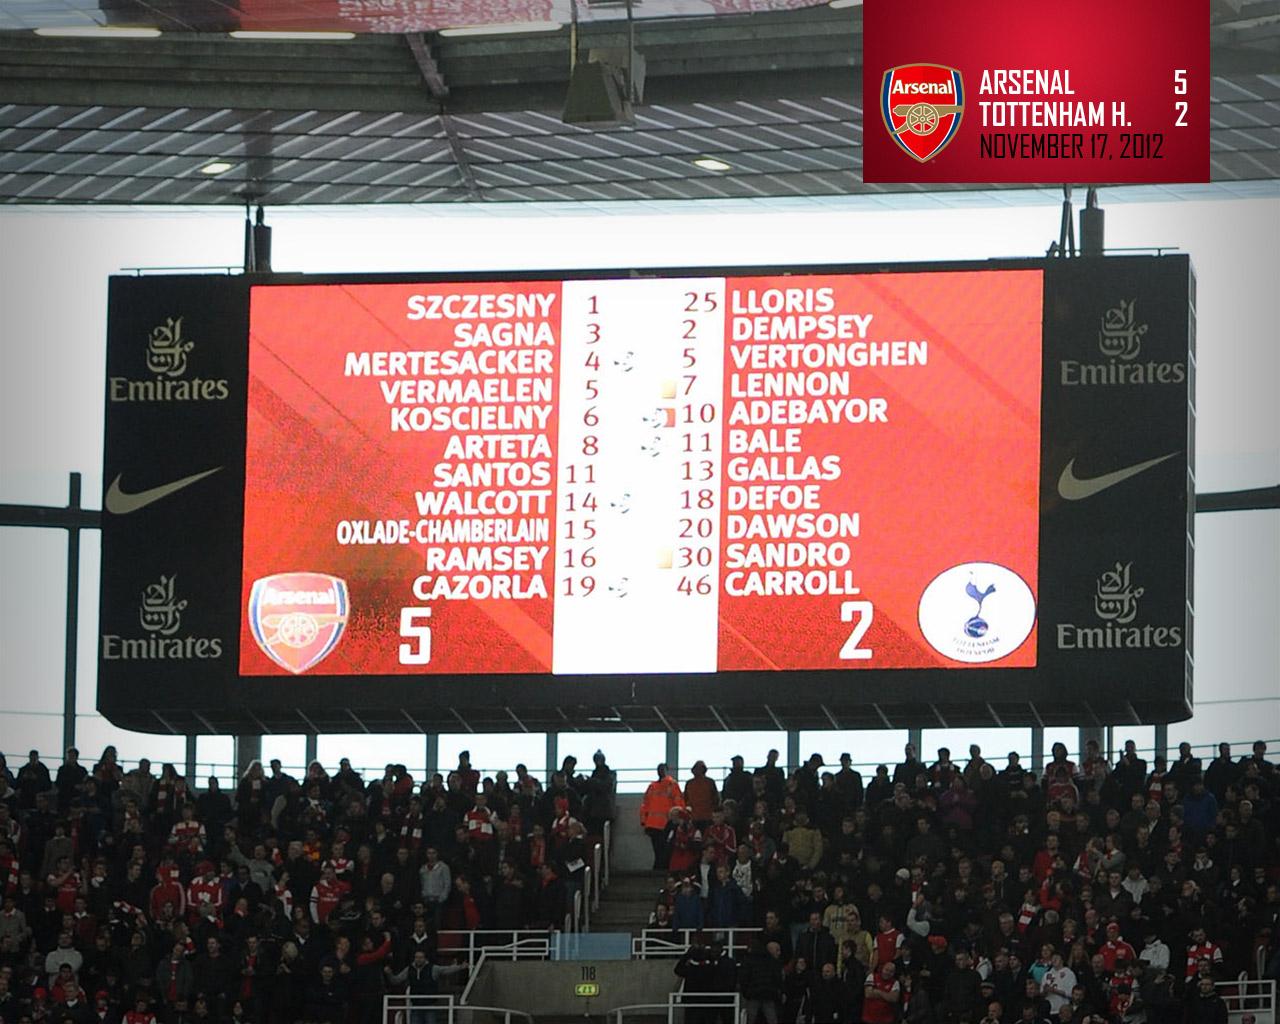 Arsenal Emirates Stadium Wallpaper Hd Football Wallpapers 1280x1024